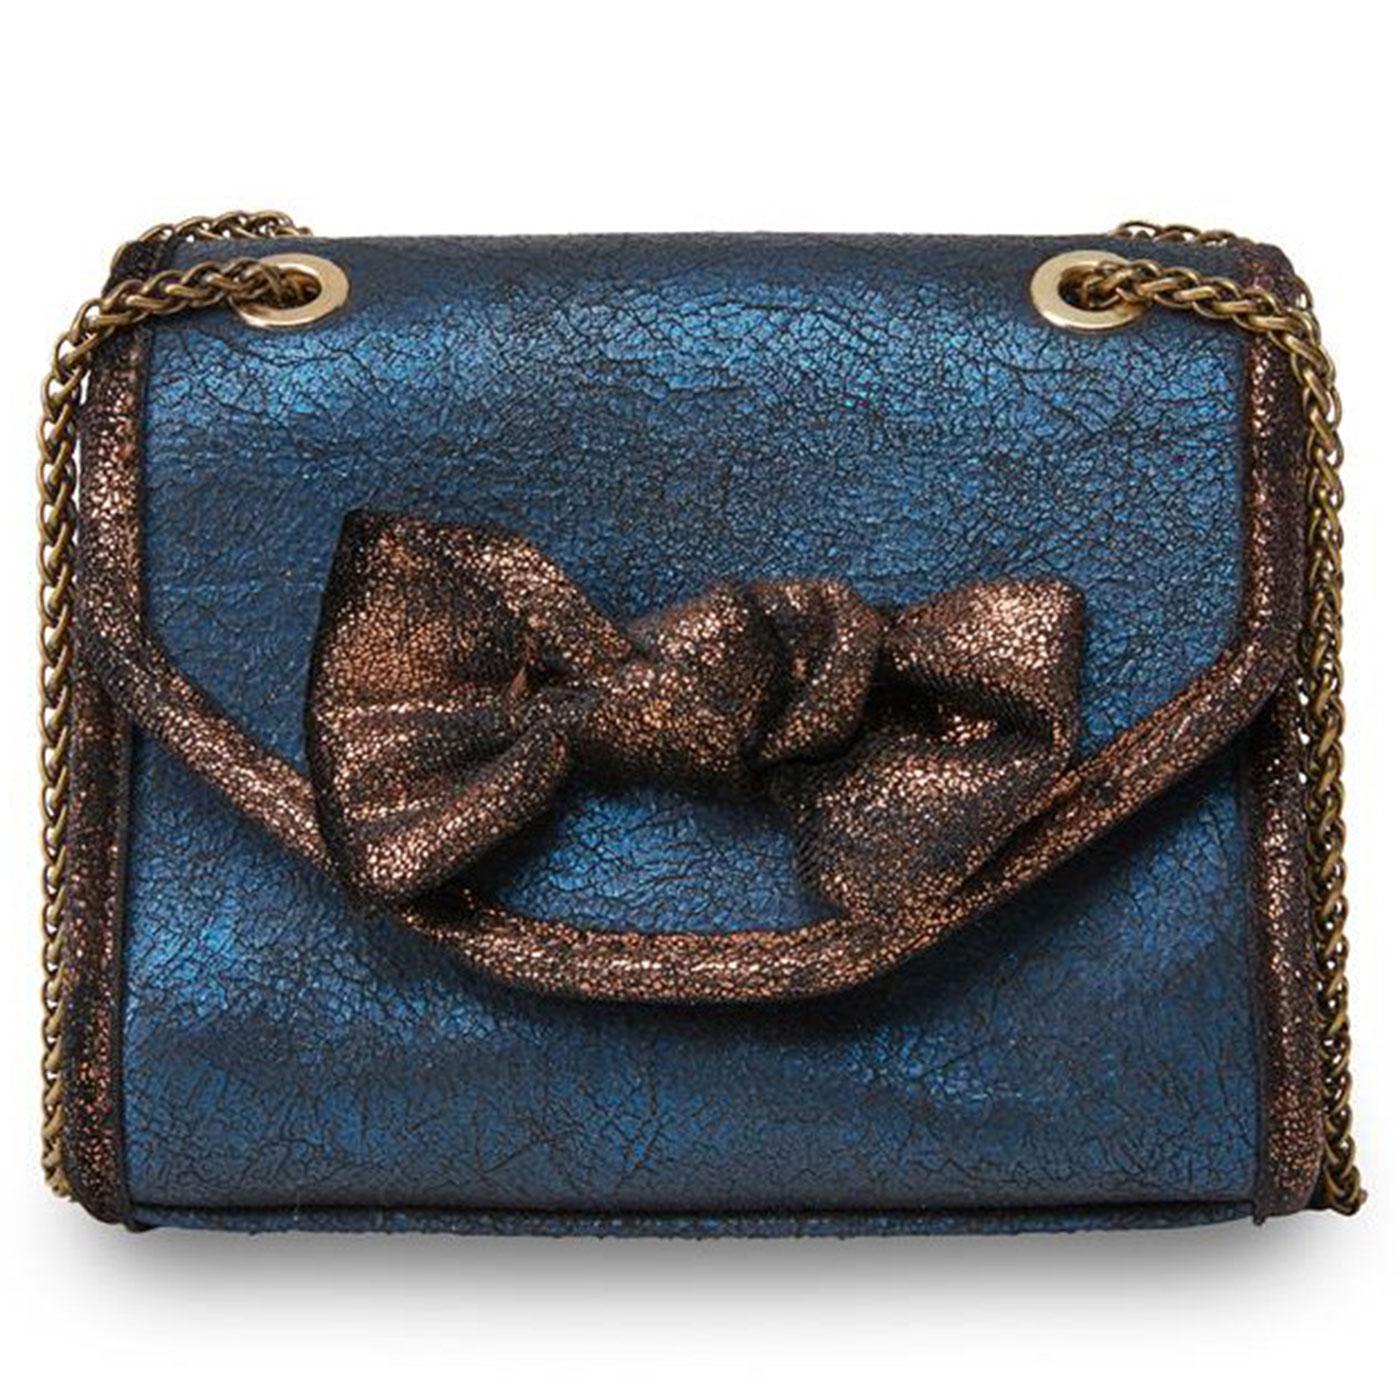 Jezabel JOE BROWNS Vintage Metallic Bow Handbag